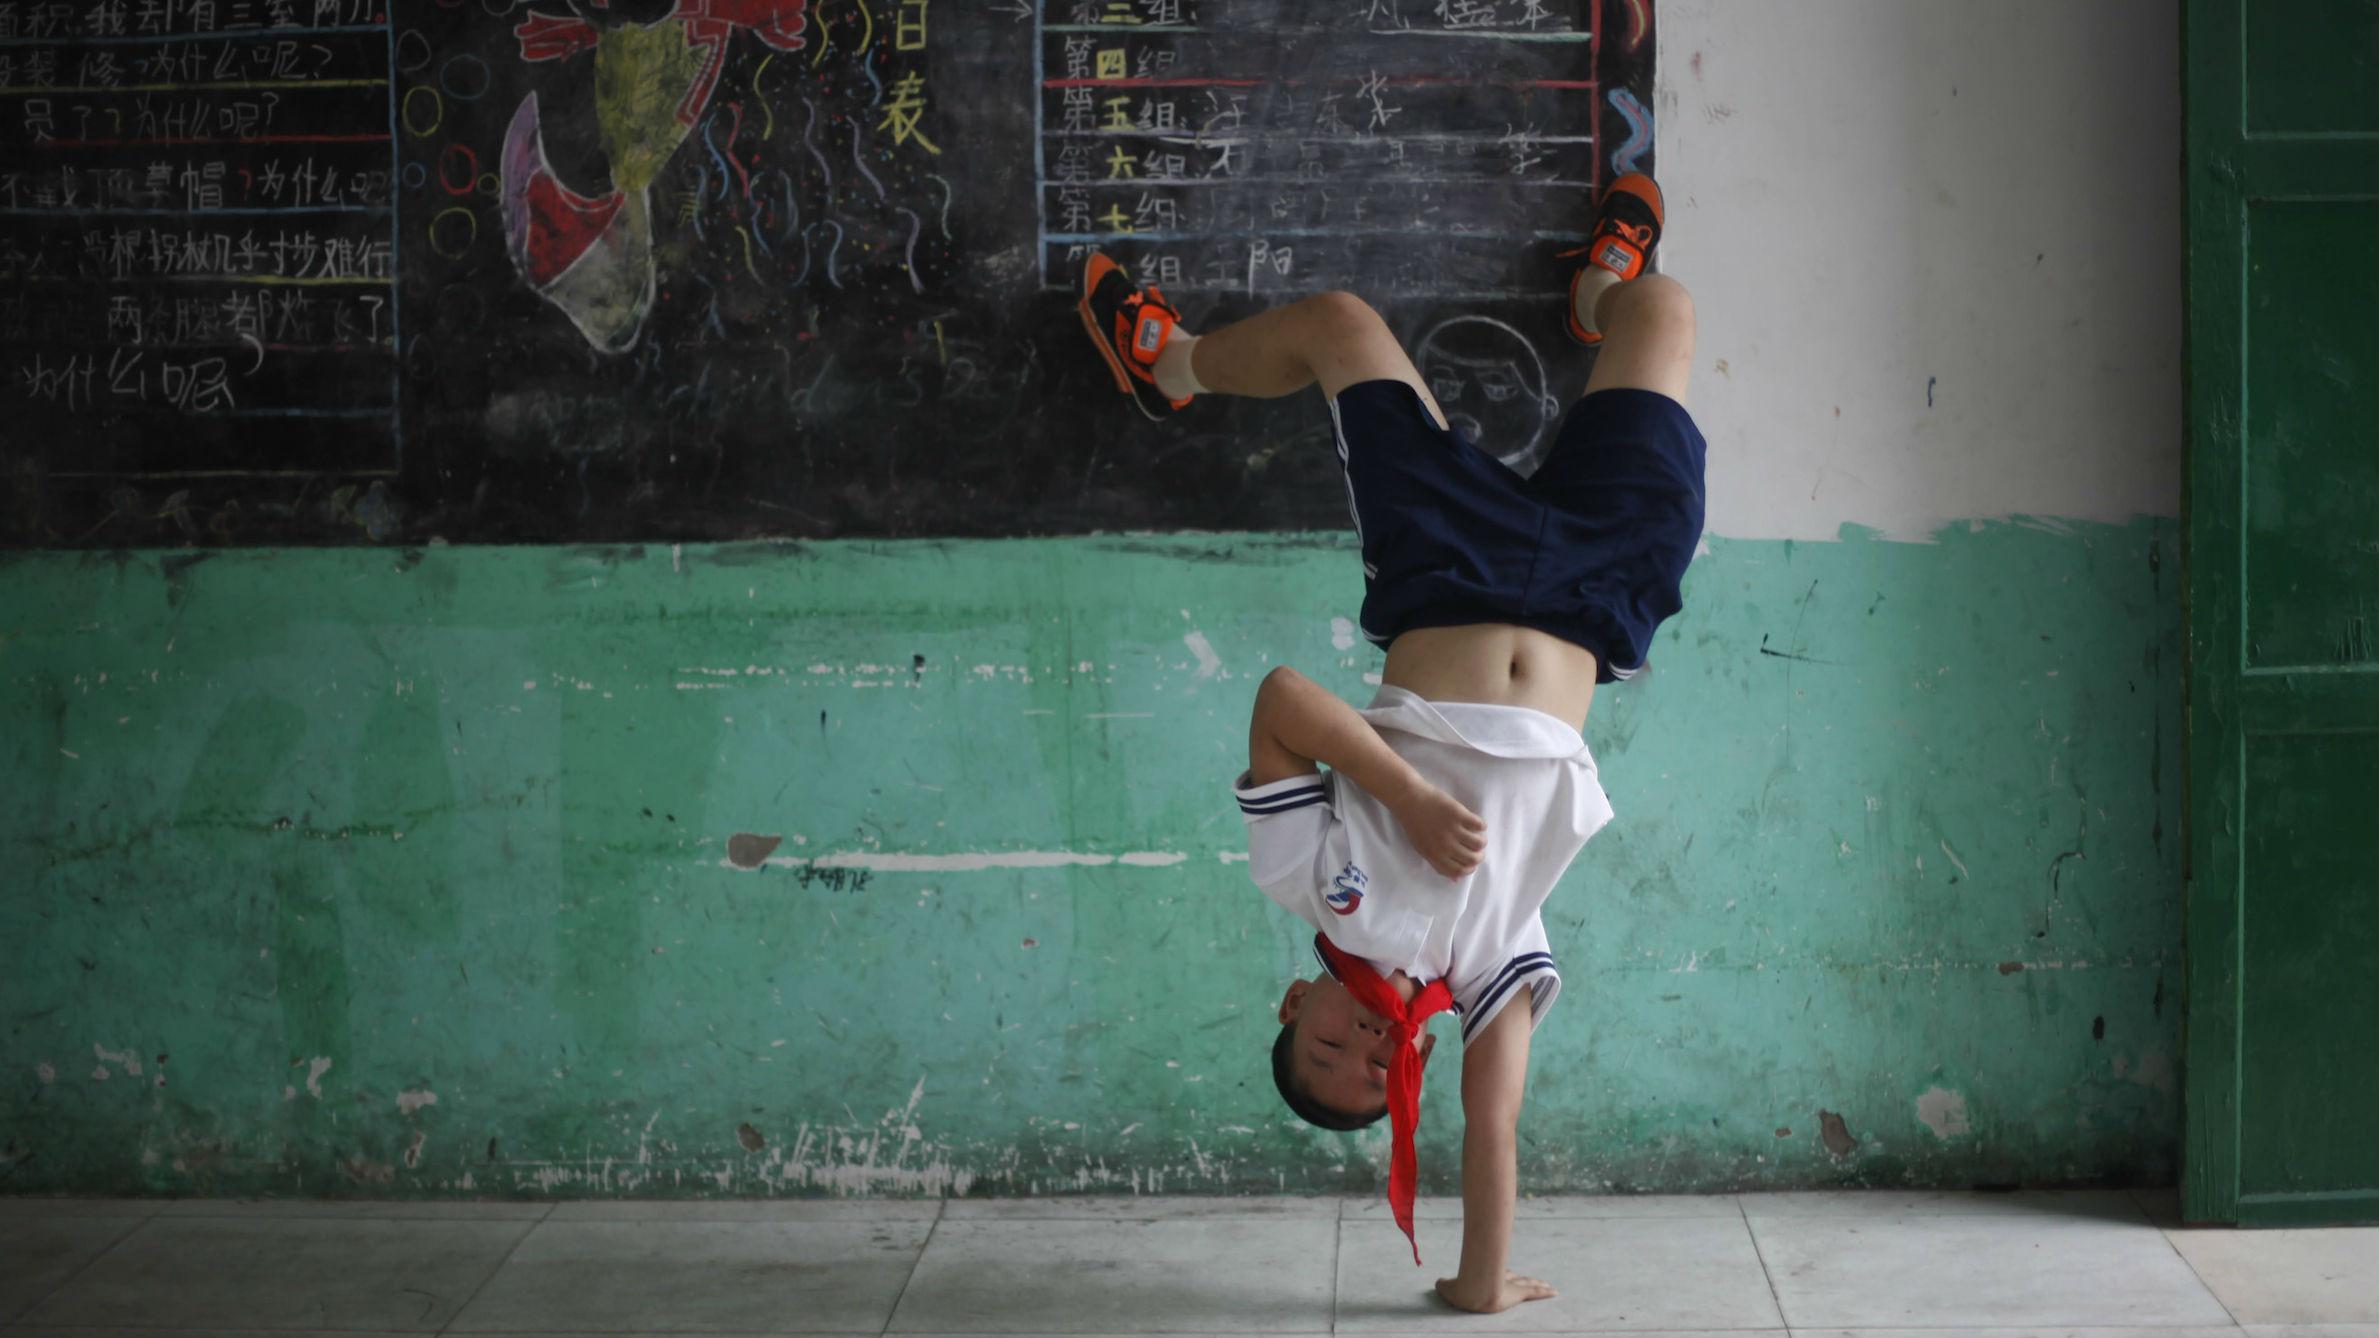 Chinese child doing a cartwheel